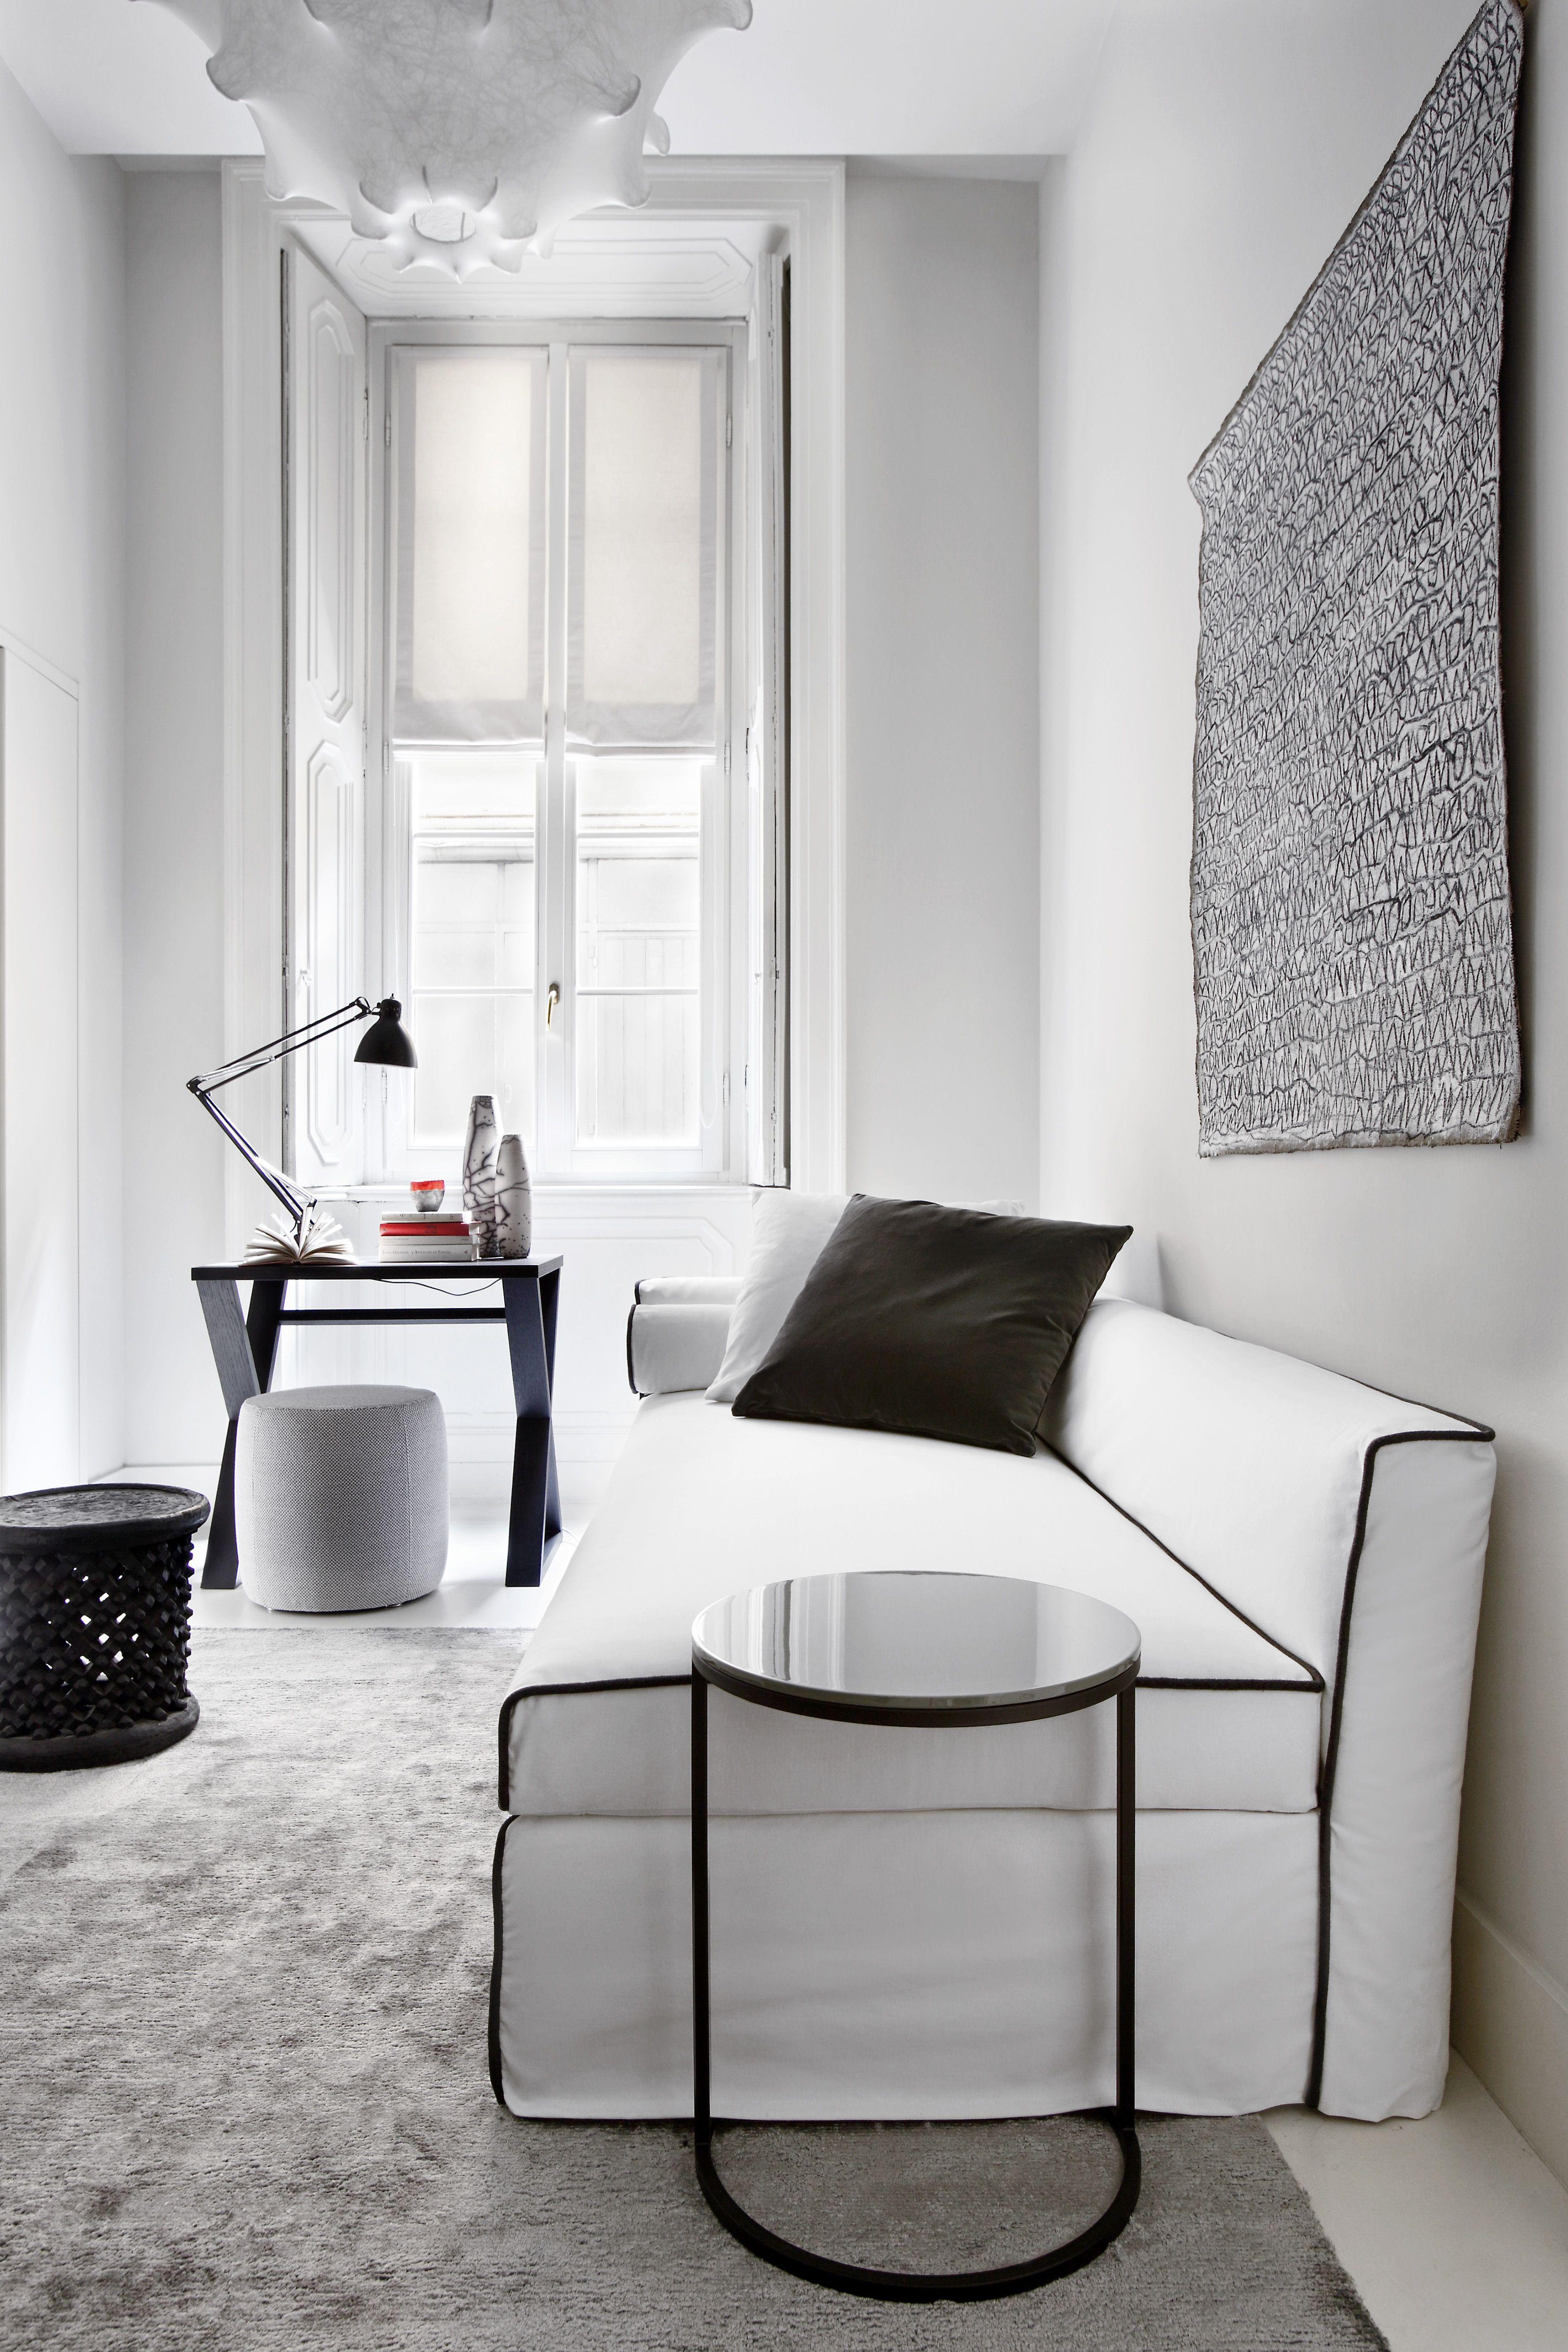 MERIDIANI I LAW sofa bed I PECK low table I CRUISE writing desk I CHARLOT ottoman